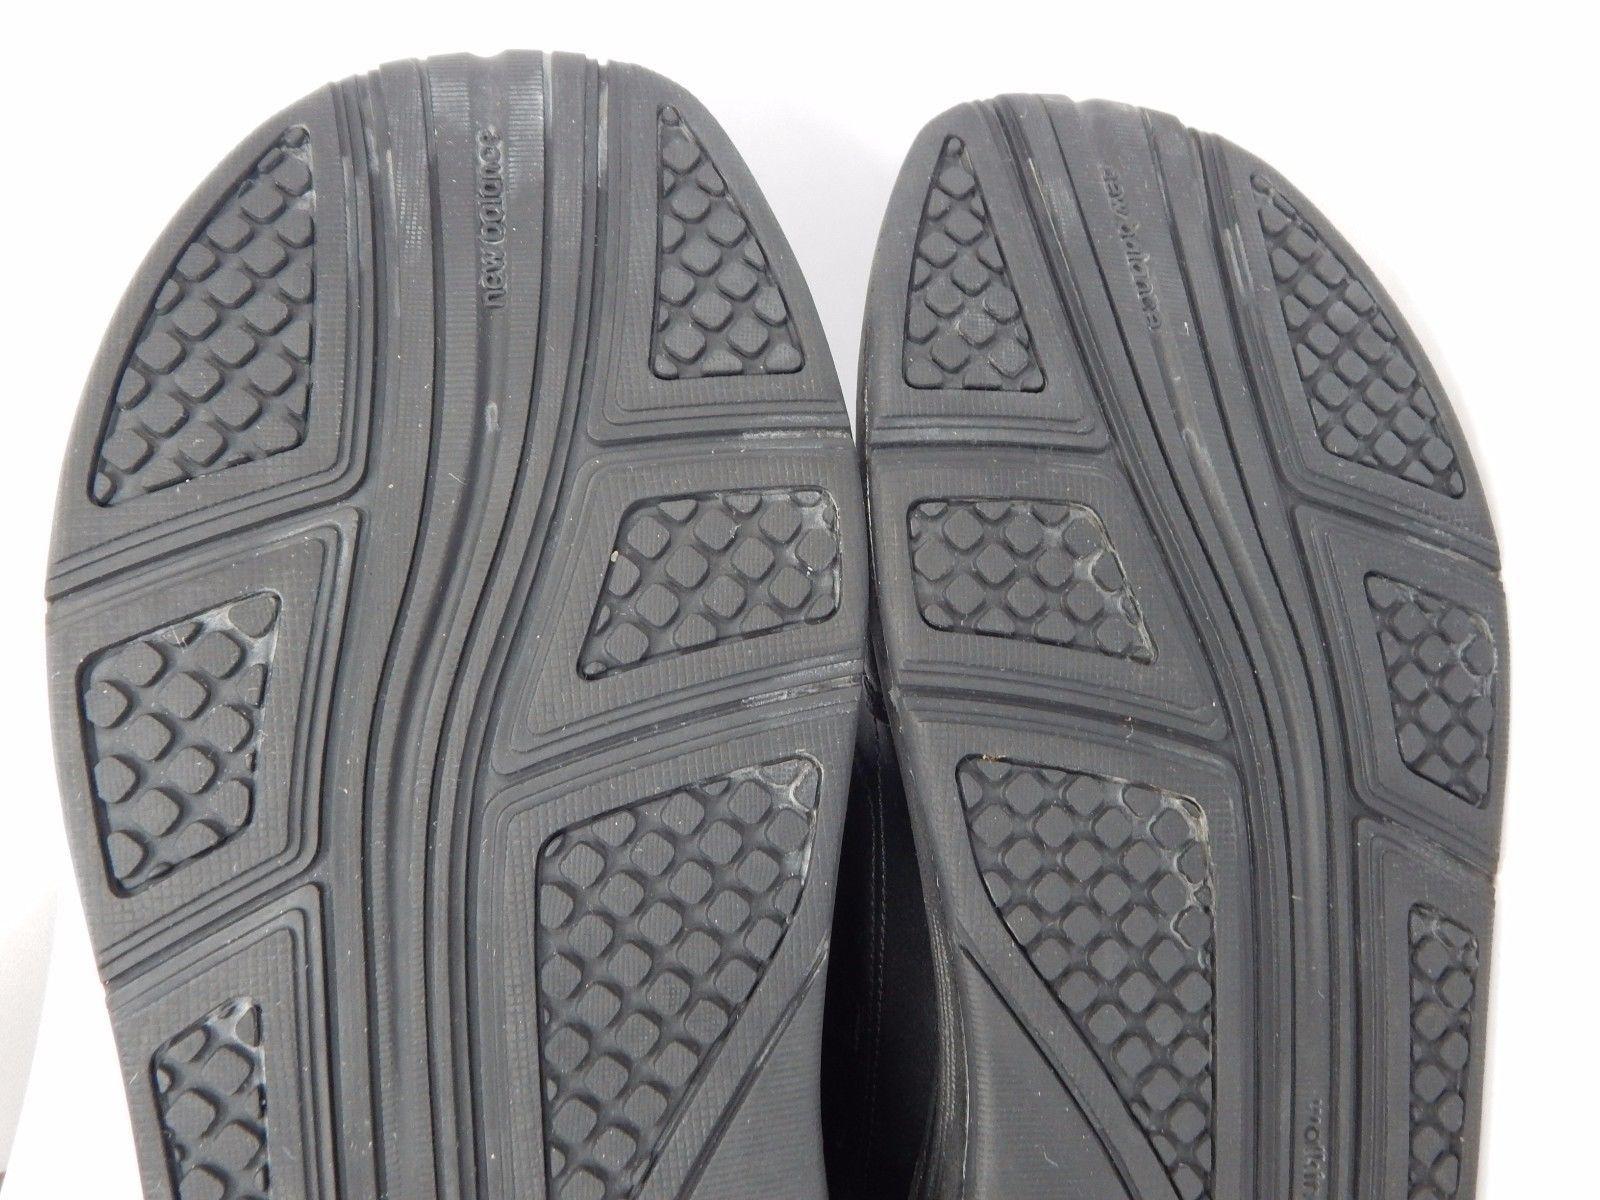 New Balance 928 Men's Leather Walking Shoes Size US 13 B NARROW EU 47.5 MW928VK